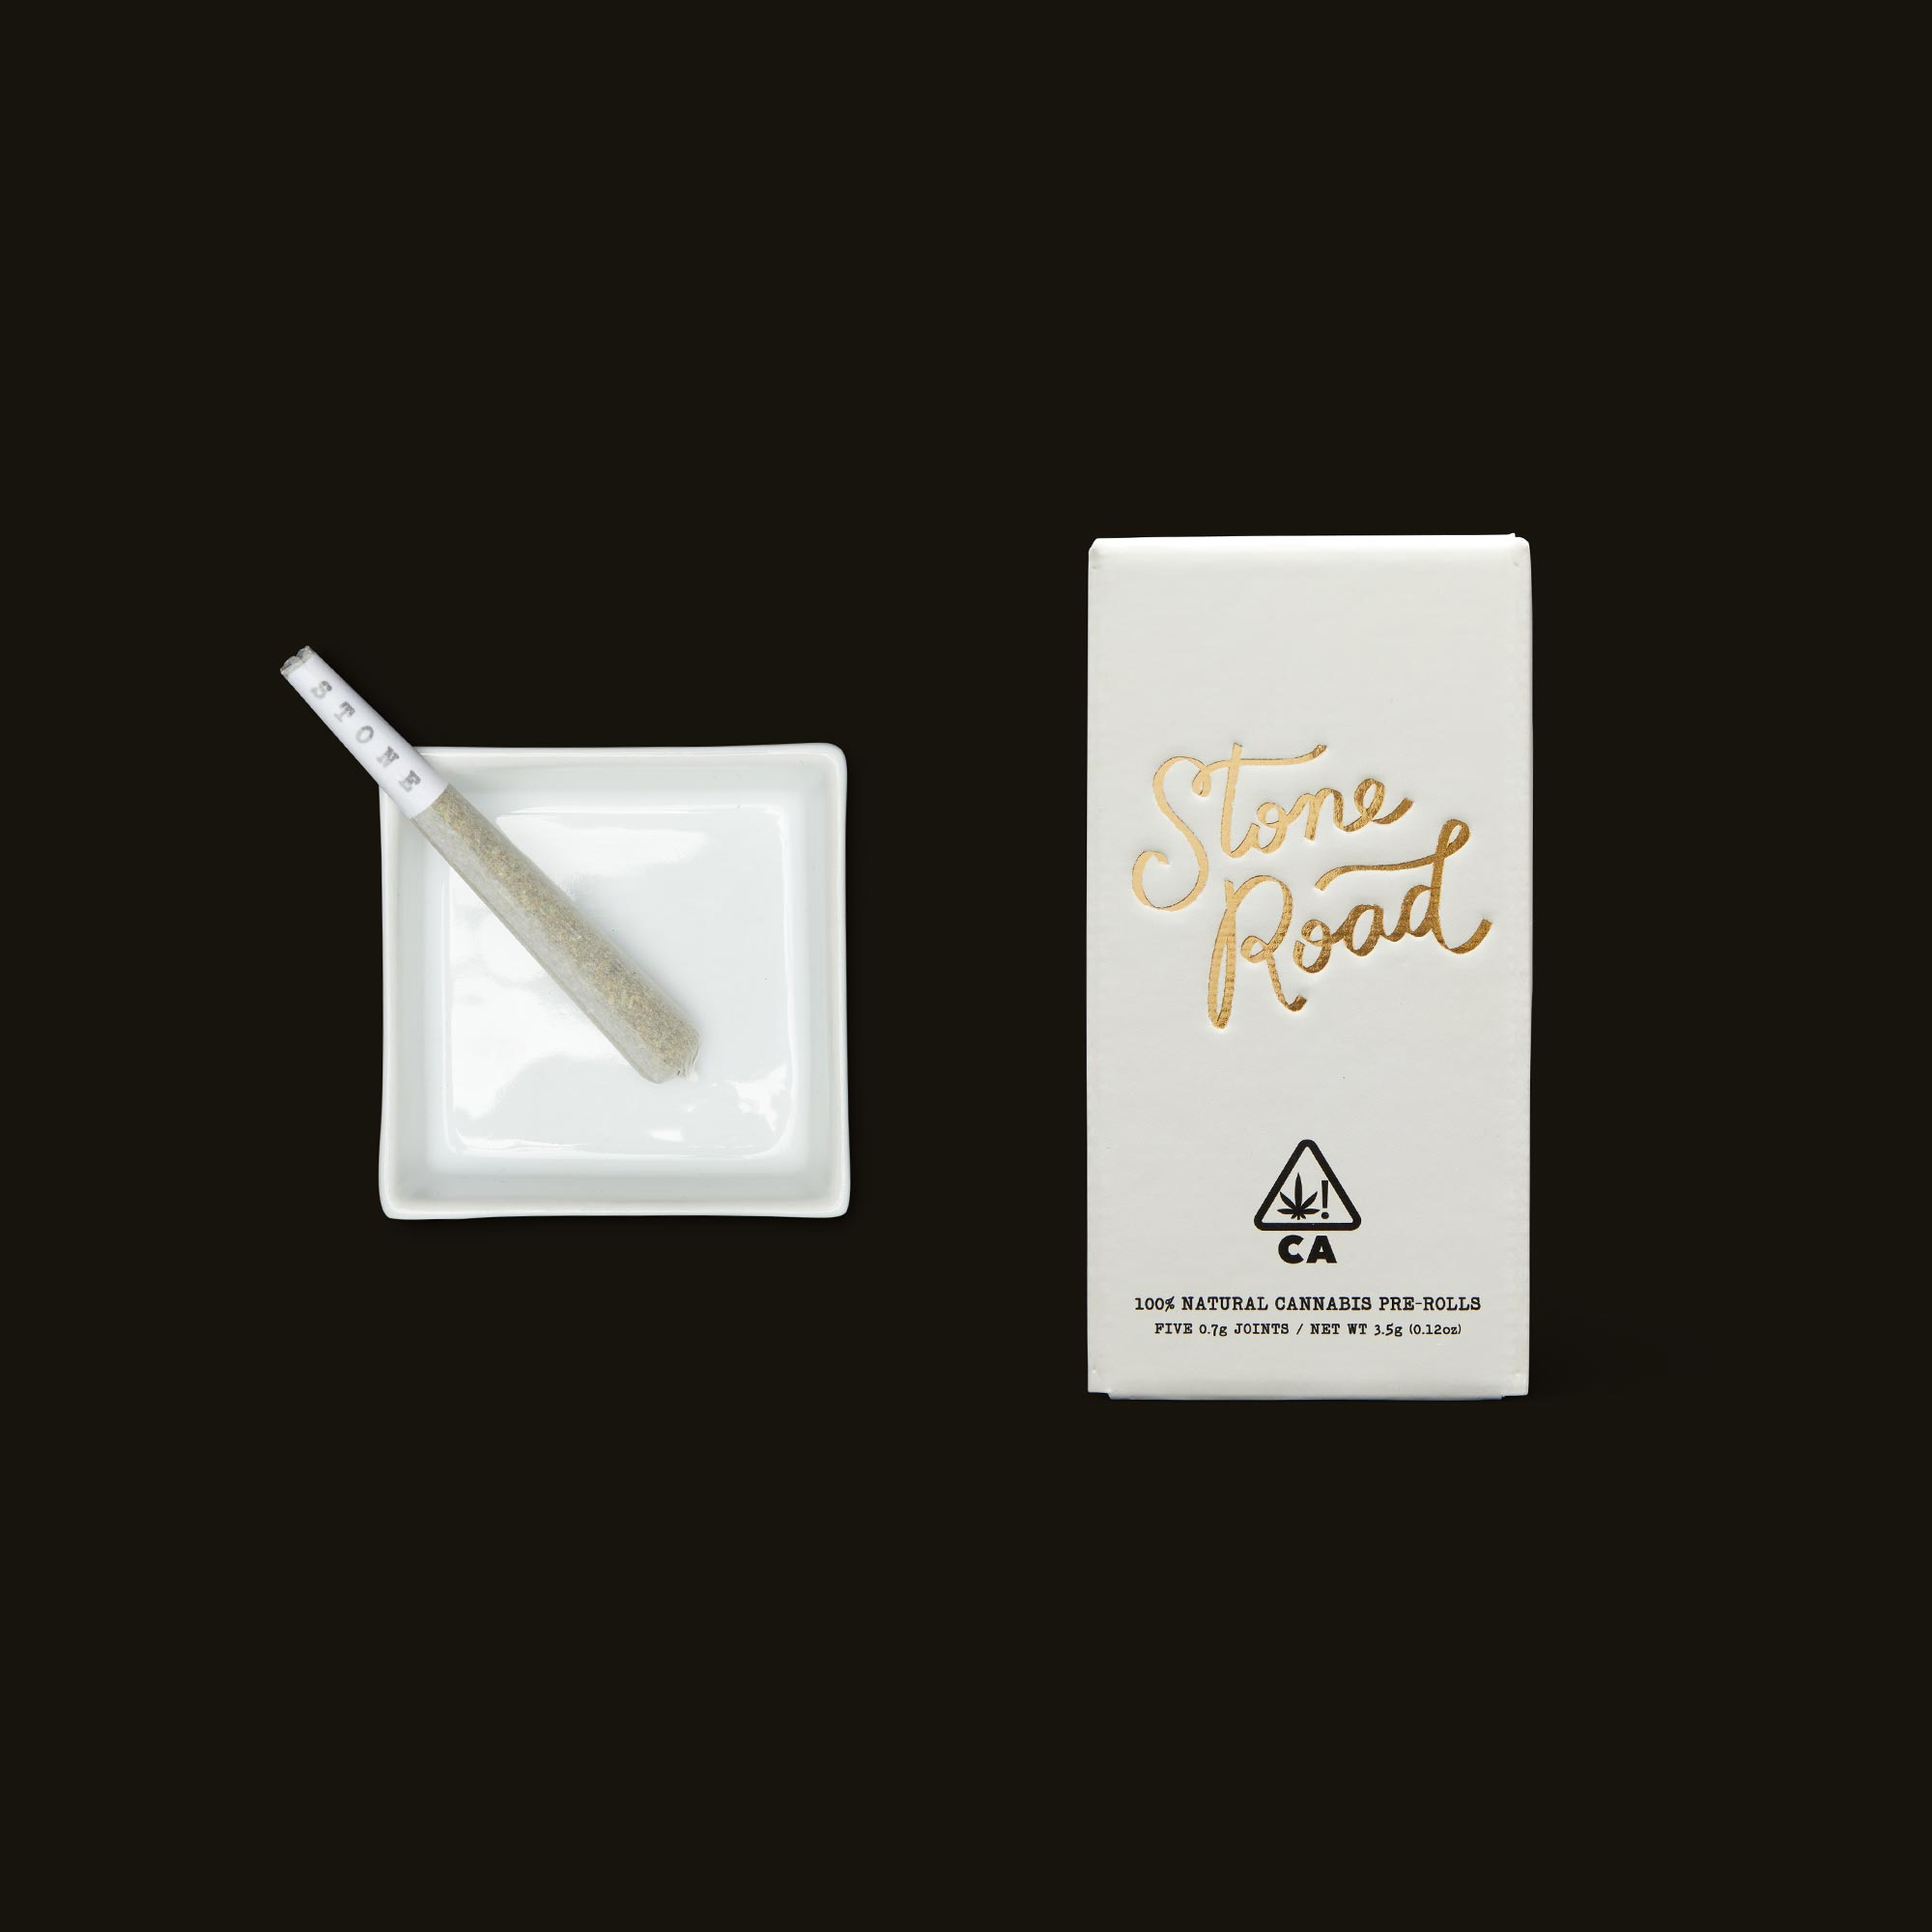 Stone Road Peanut Butter Breath Pre-Roll Pack